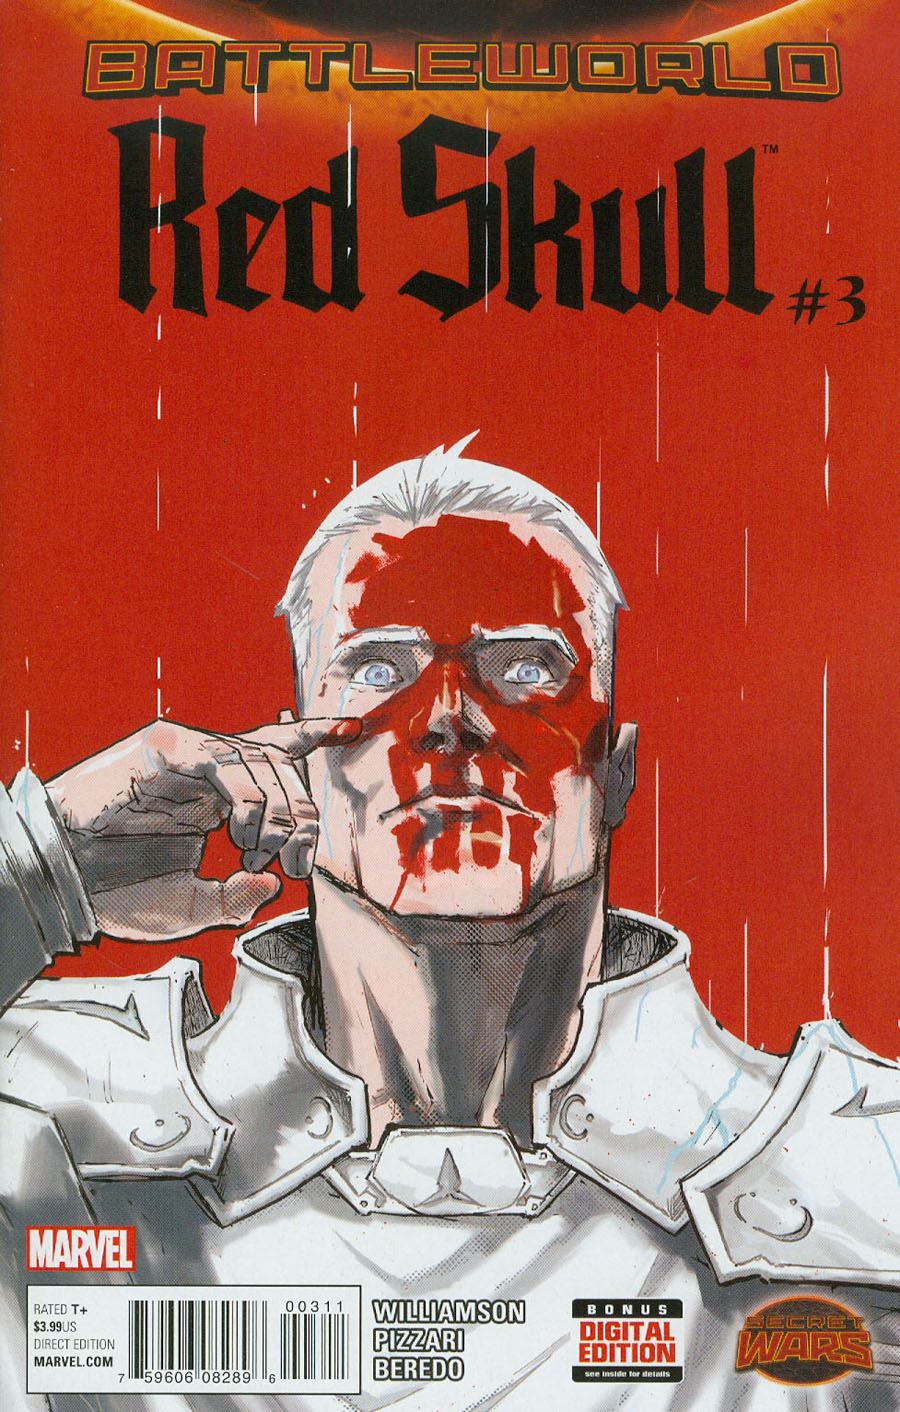 Red Skull Vol 2 #3 (Secret Wars Battleworld Tie-In)